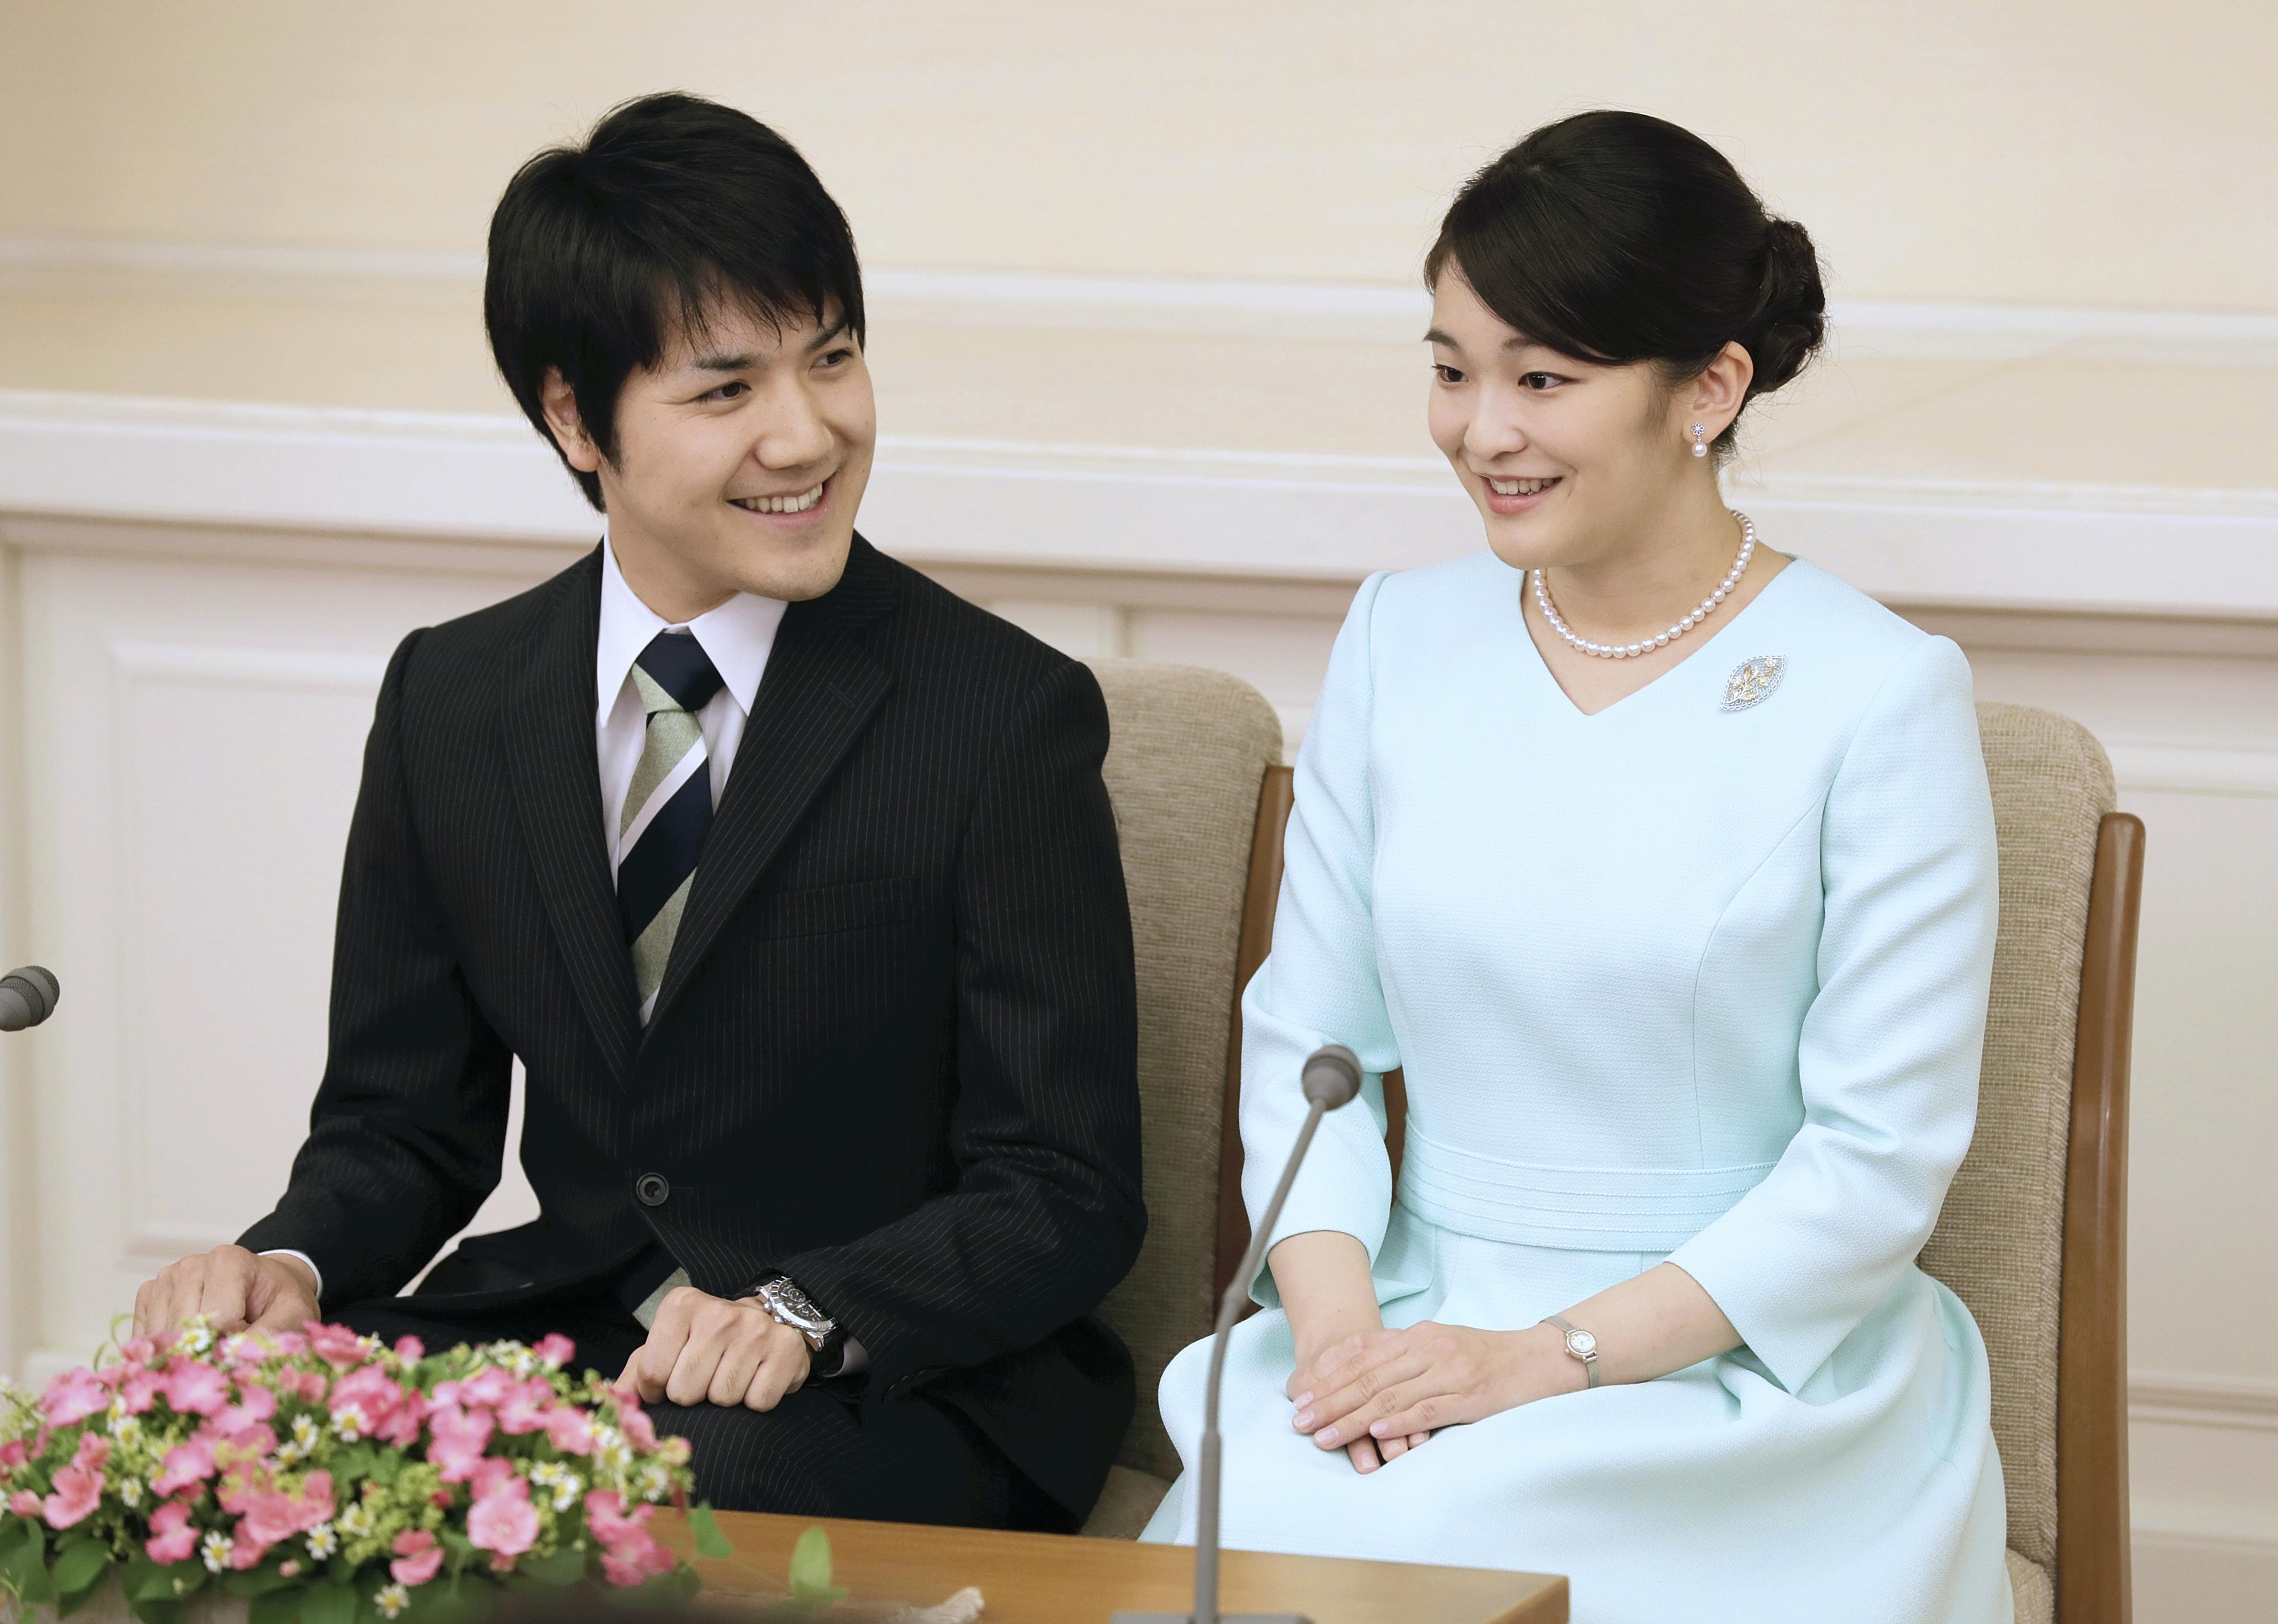 Prinzessin Mako und Kei Komuro